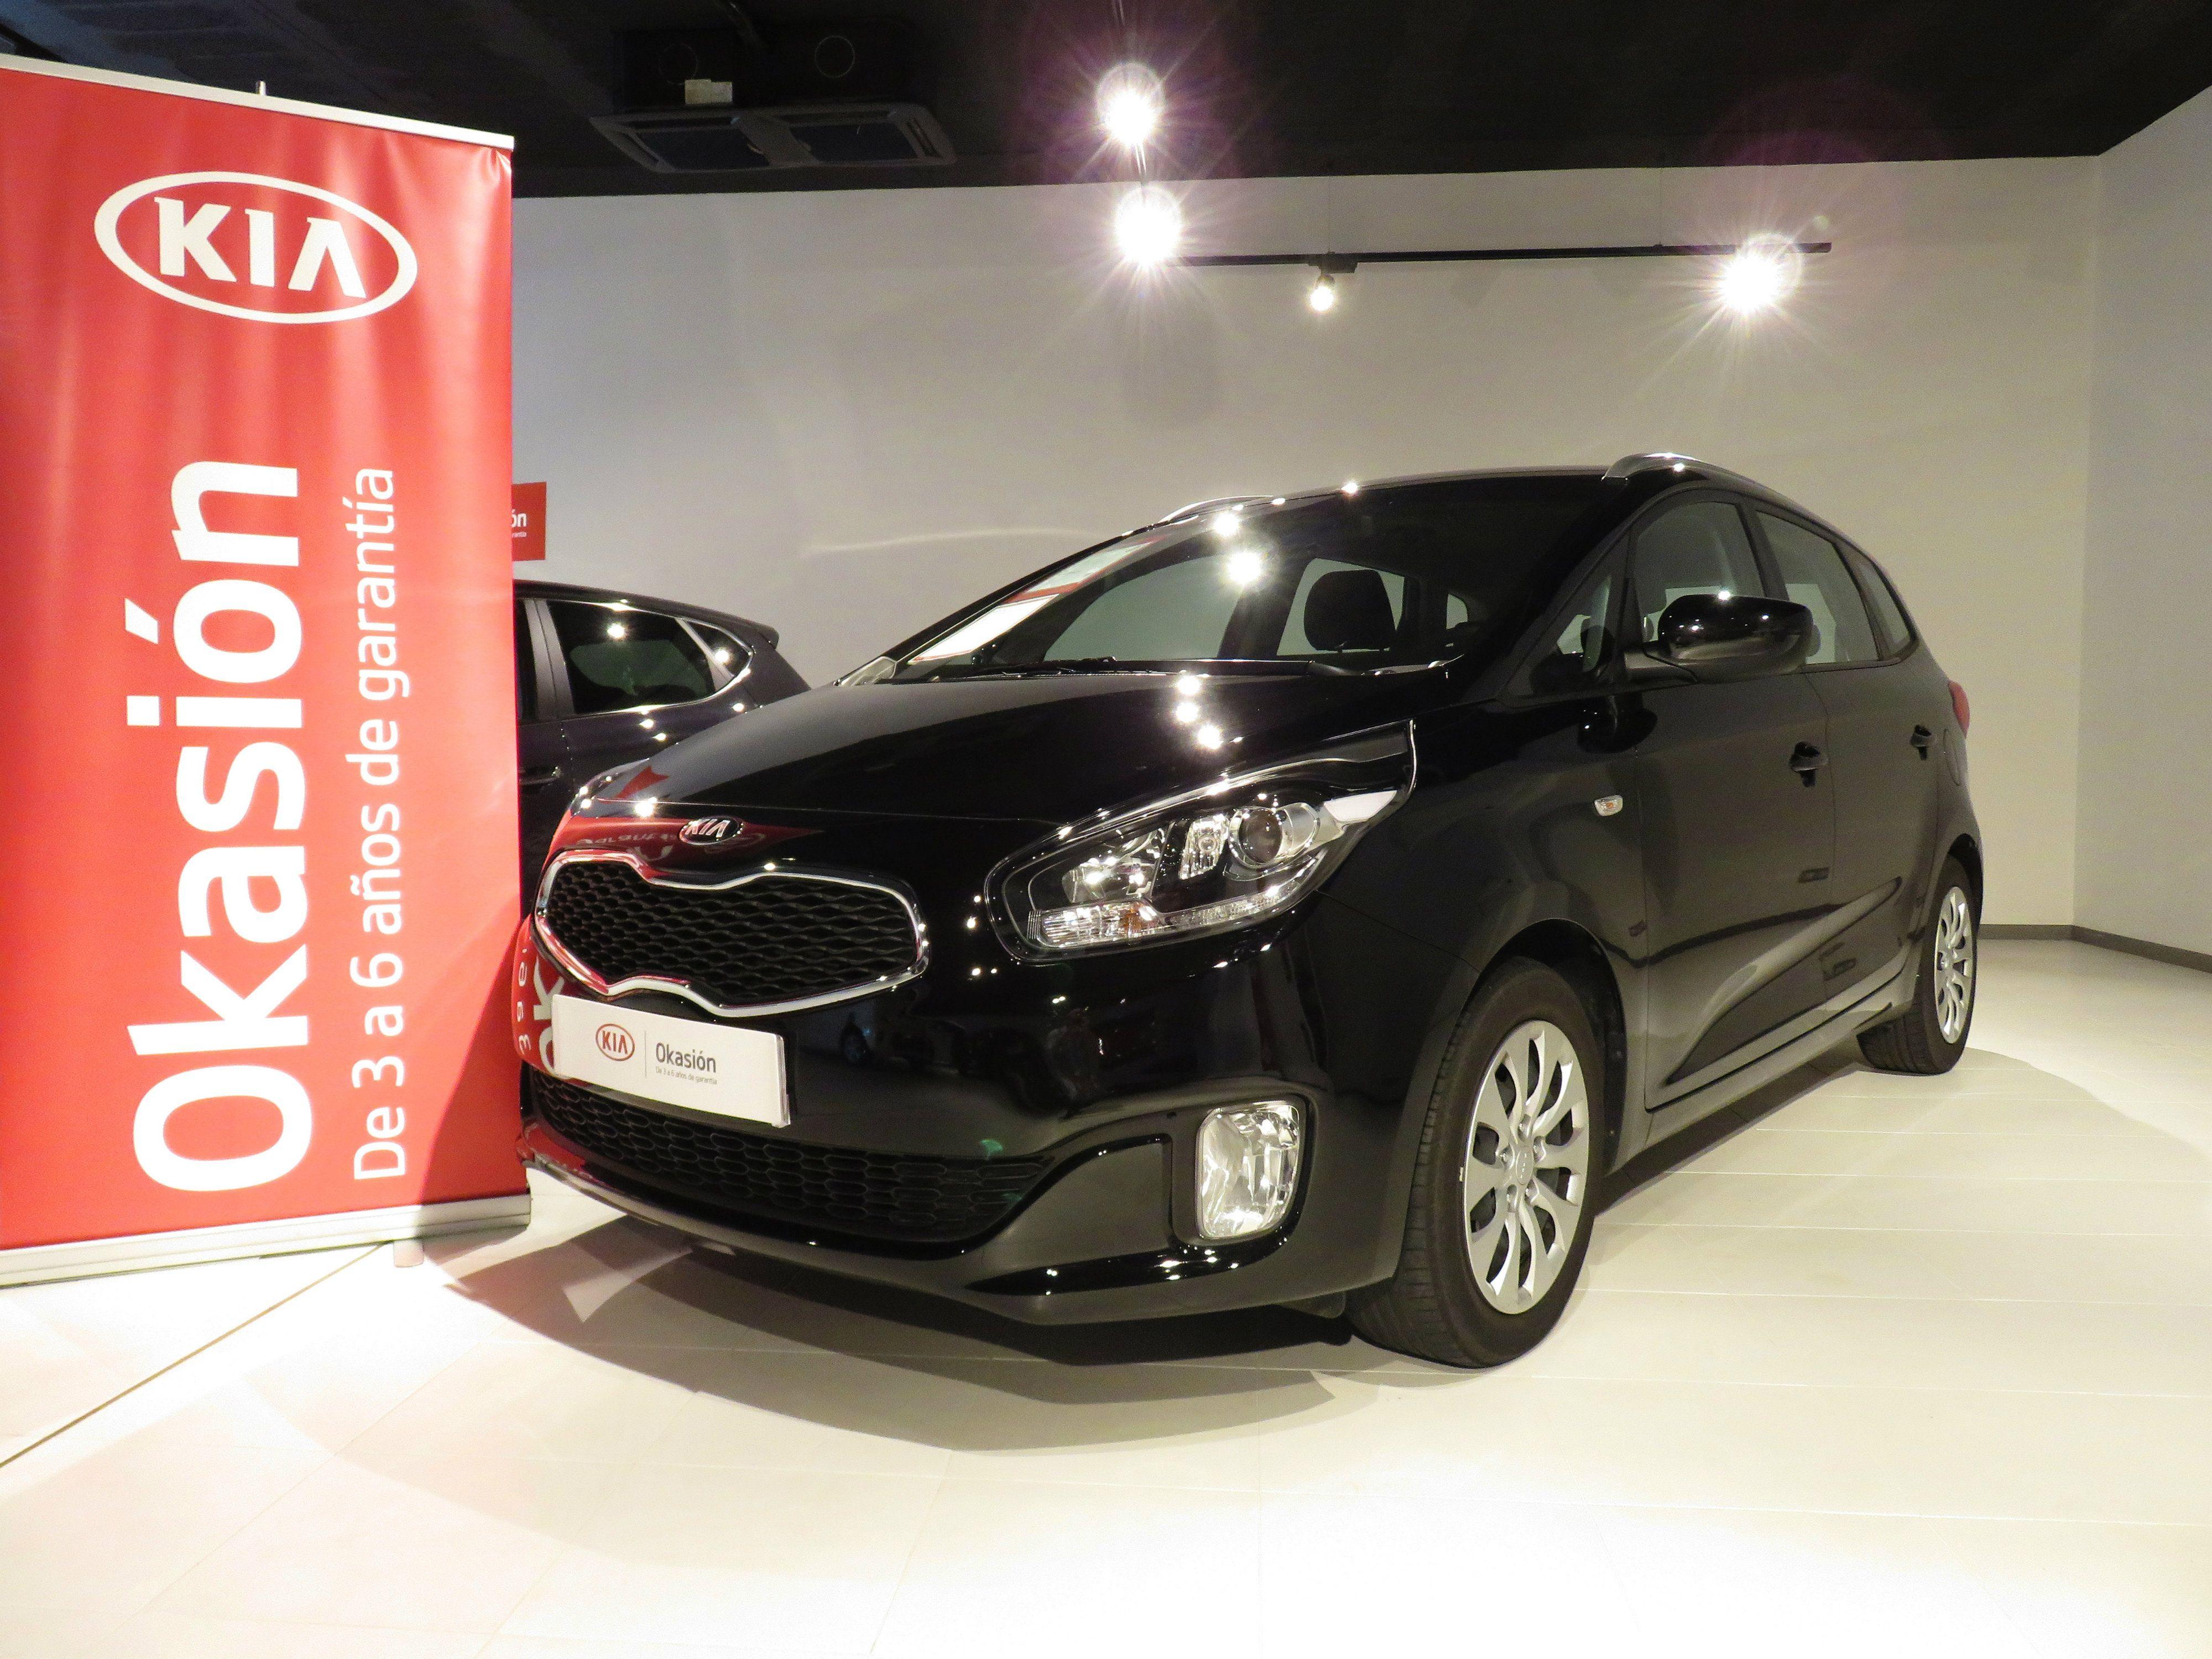 Kia Carens 1.7CRDi Concept 7 plazas por 15.550€*